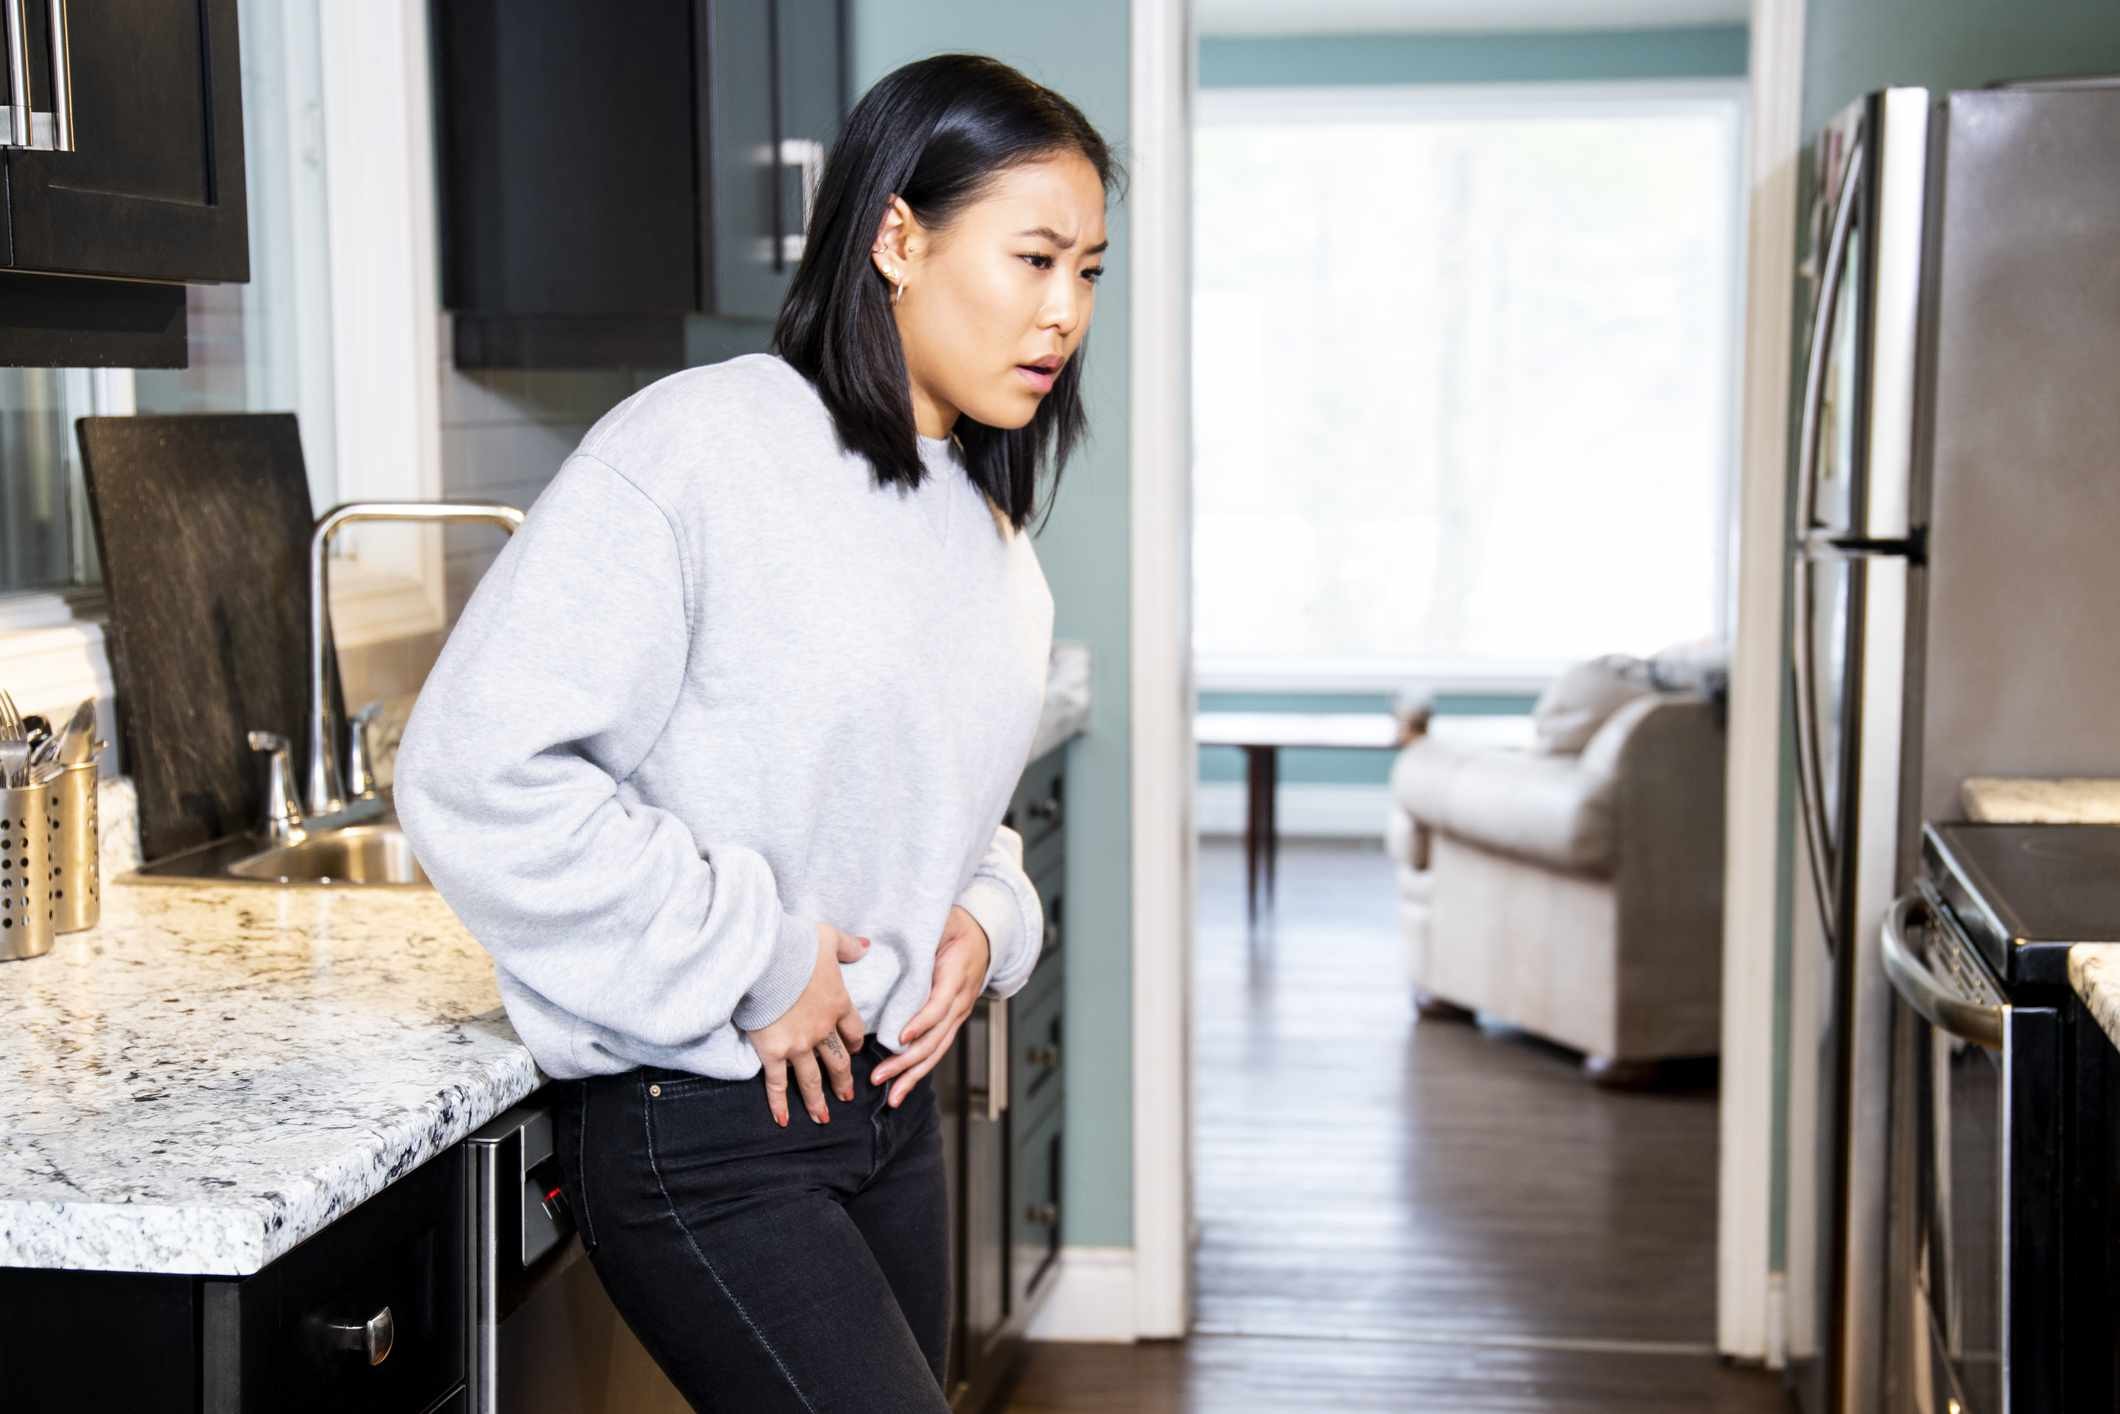 woman experiencing pelvic pain